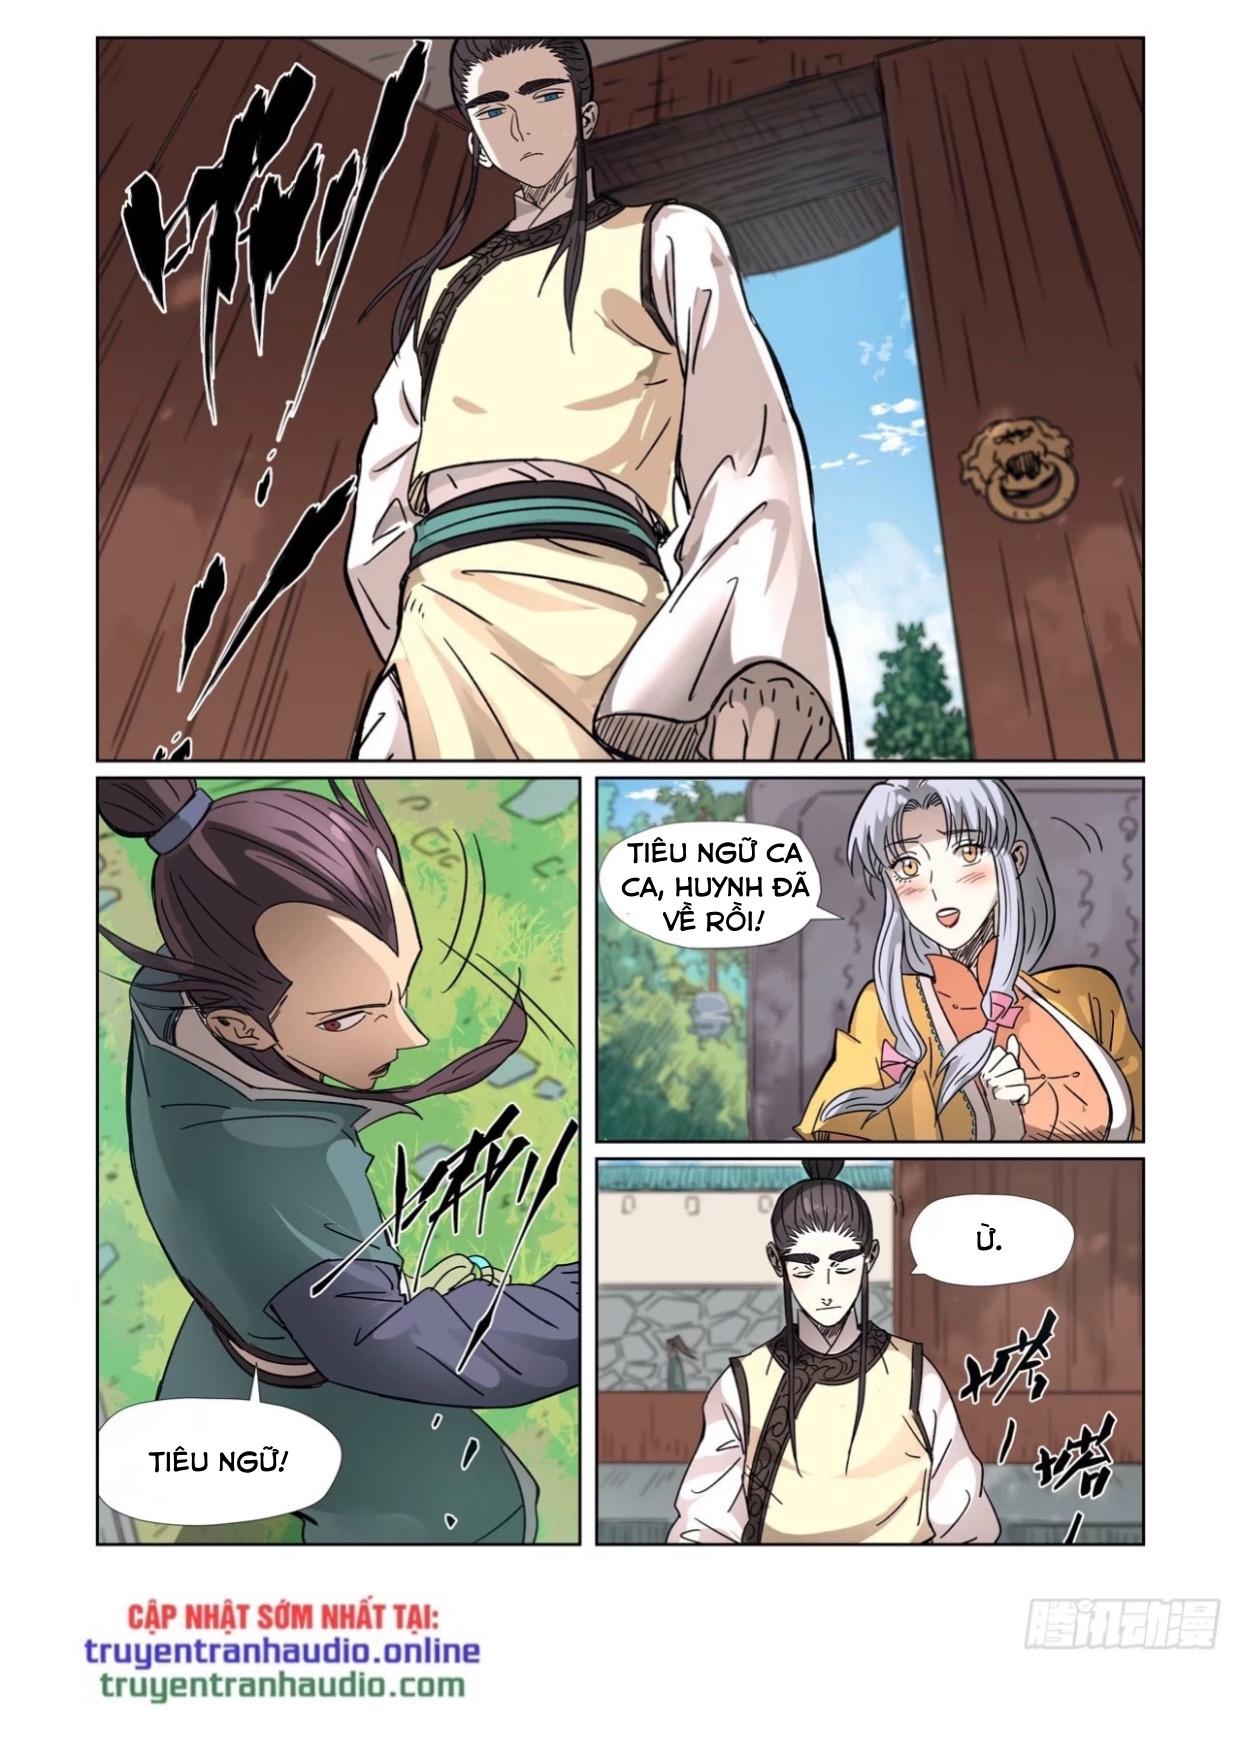 Yêu Thần Ký chap 302.5 - Trang 8